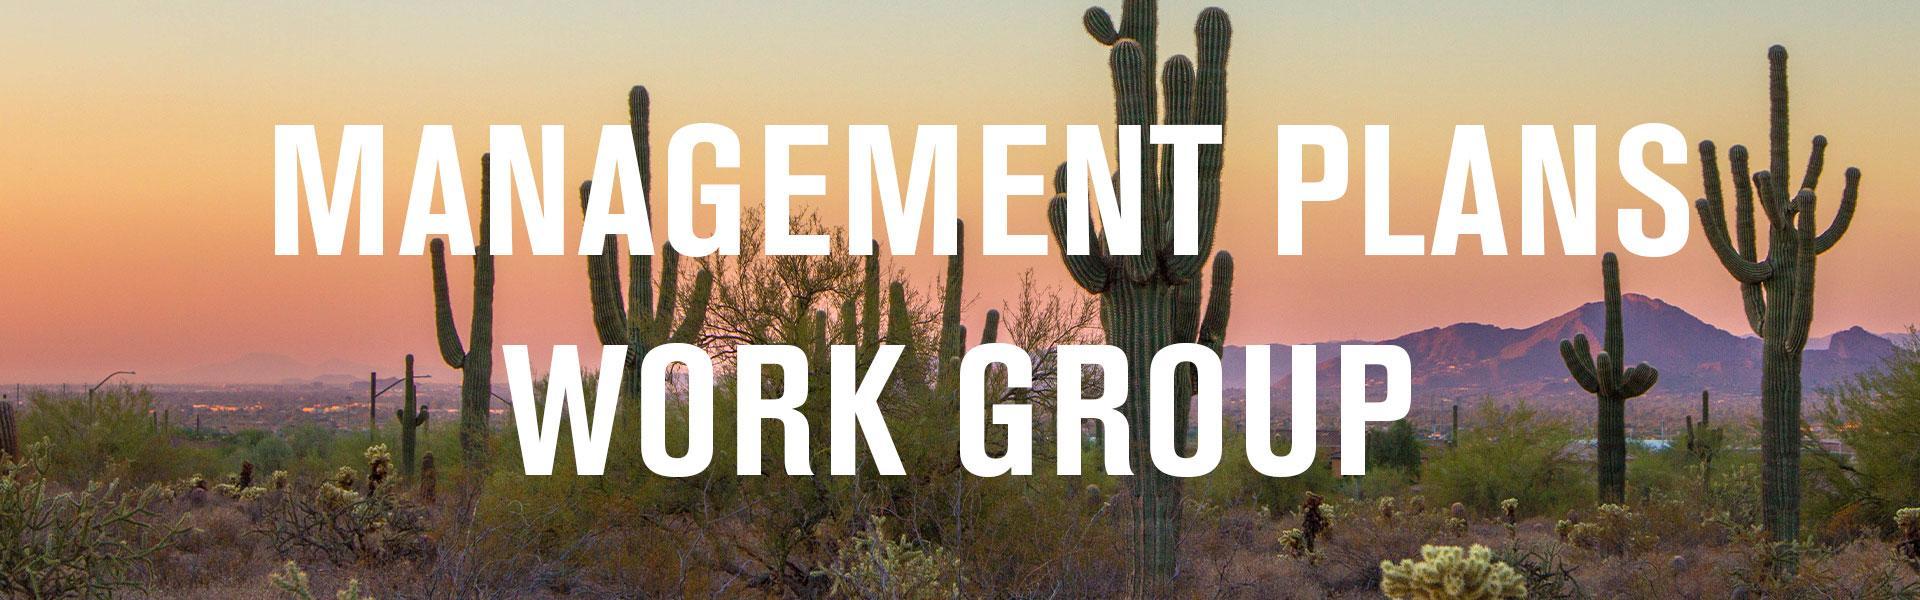 Management Plans Work Group banner